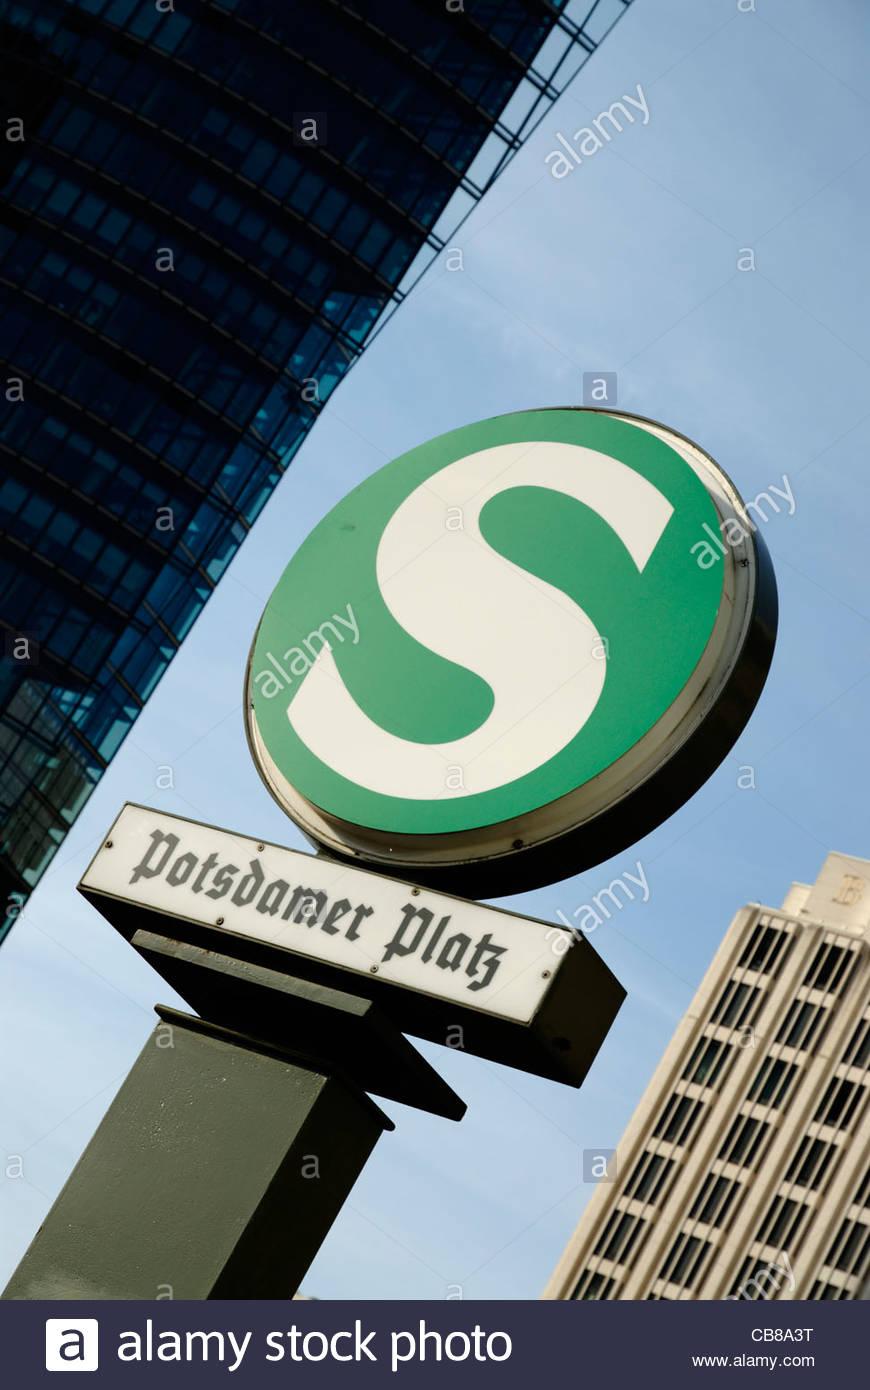 S-Bahn station sign of Potsdamer Platz in Berlin Stock Photo